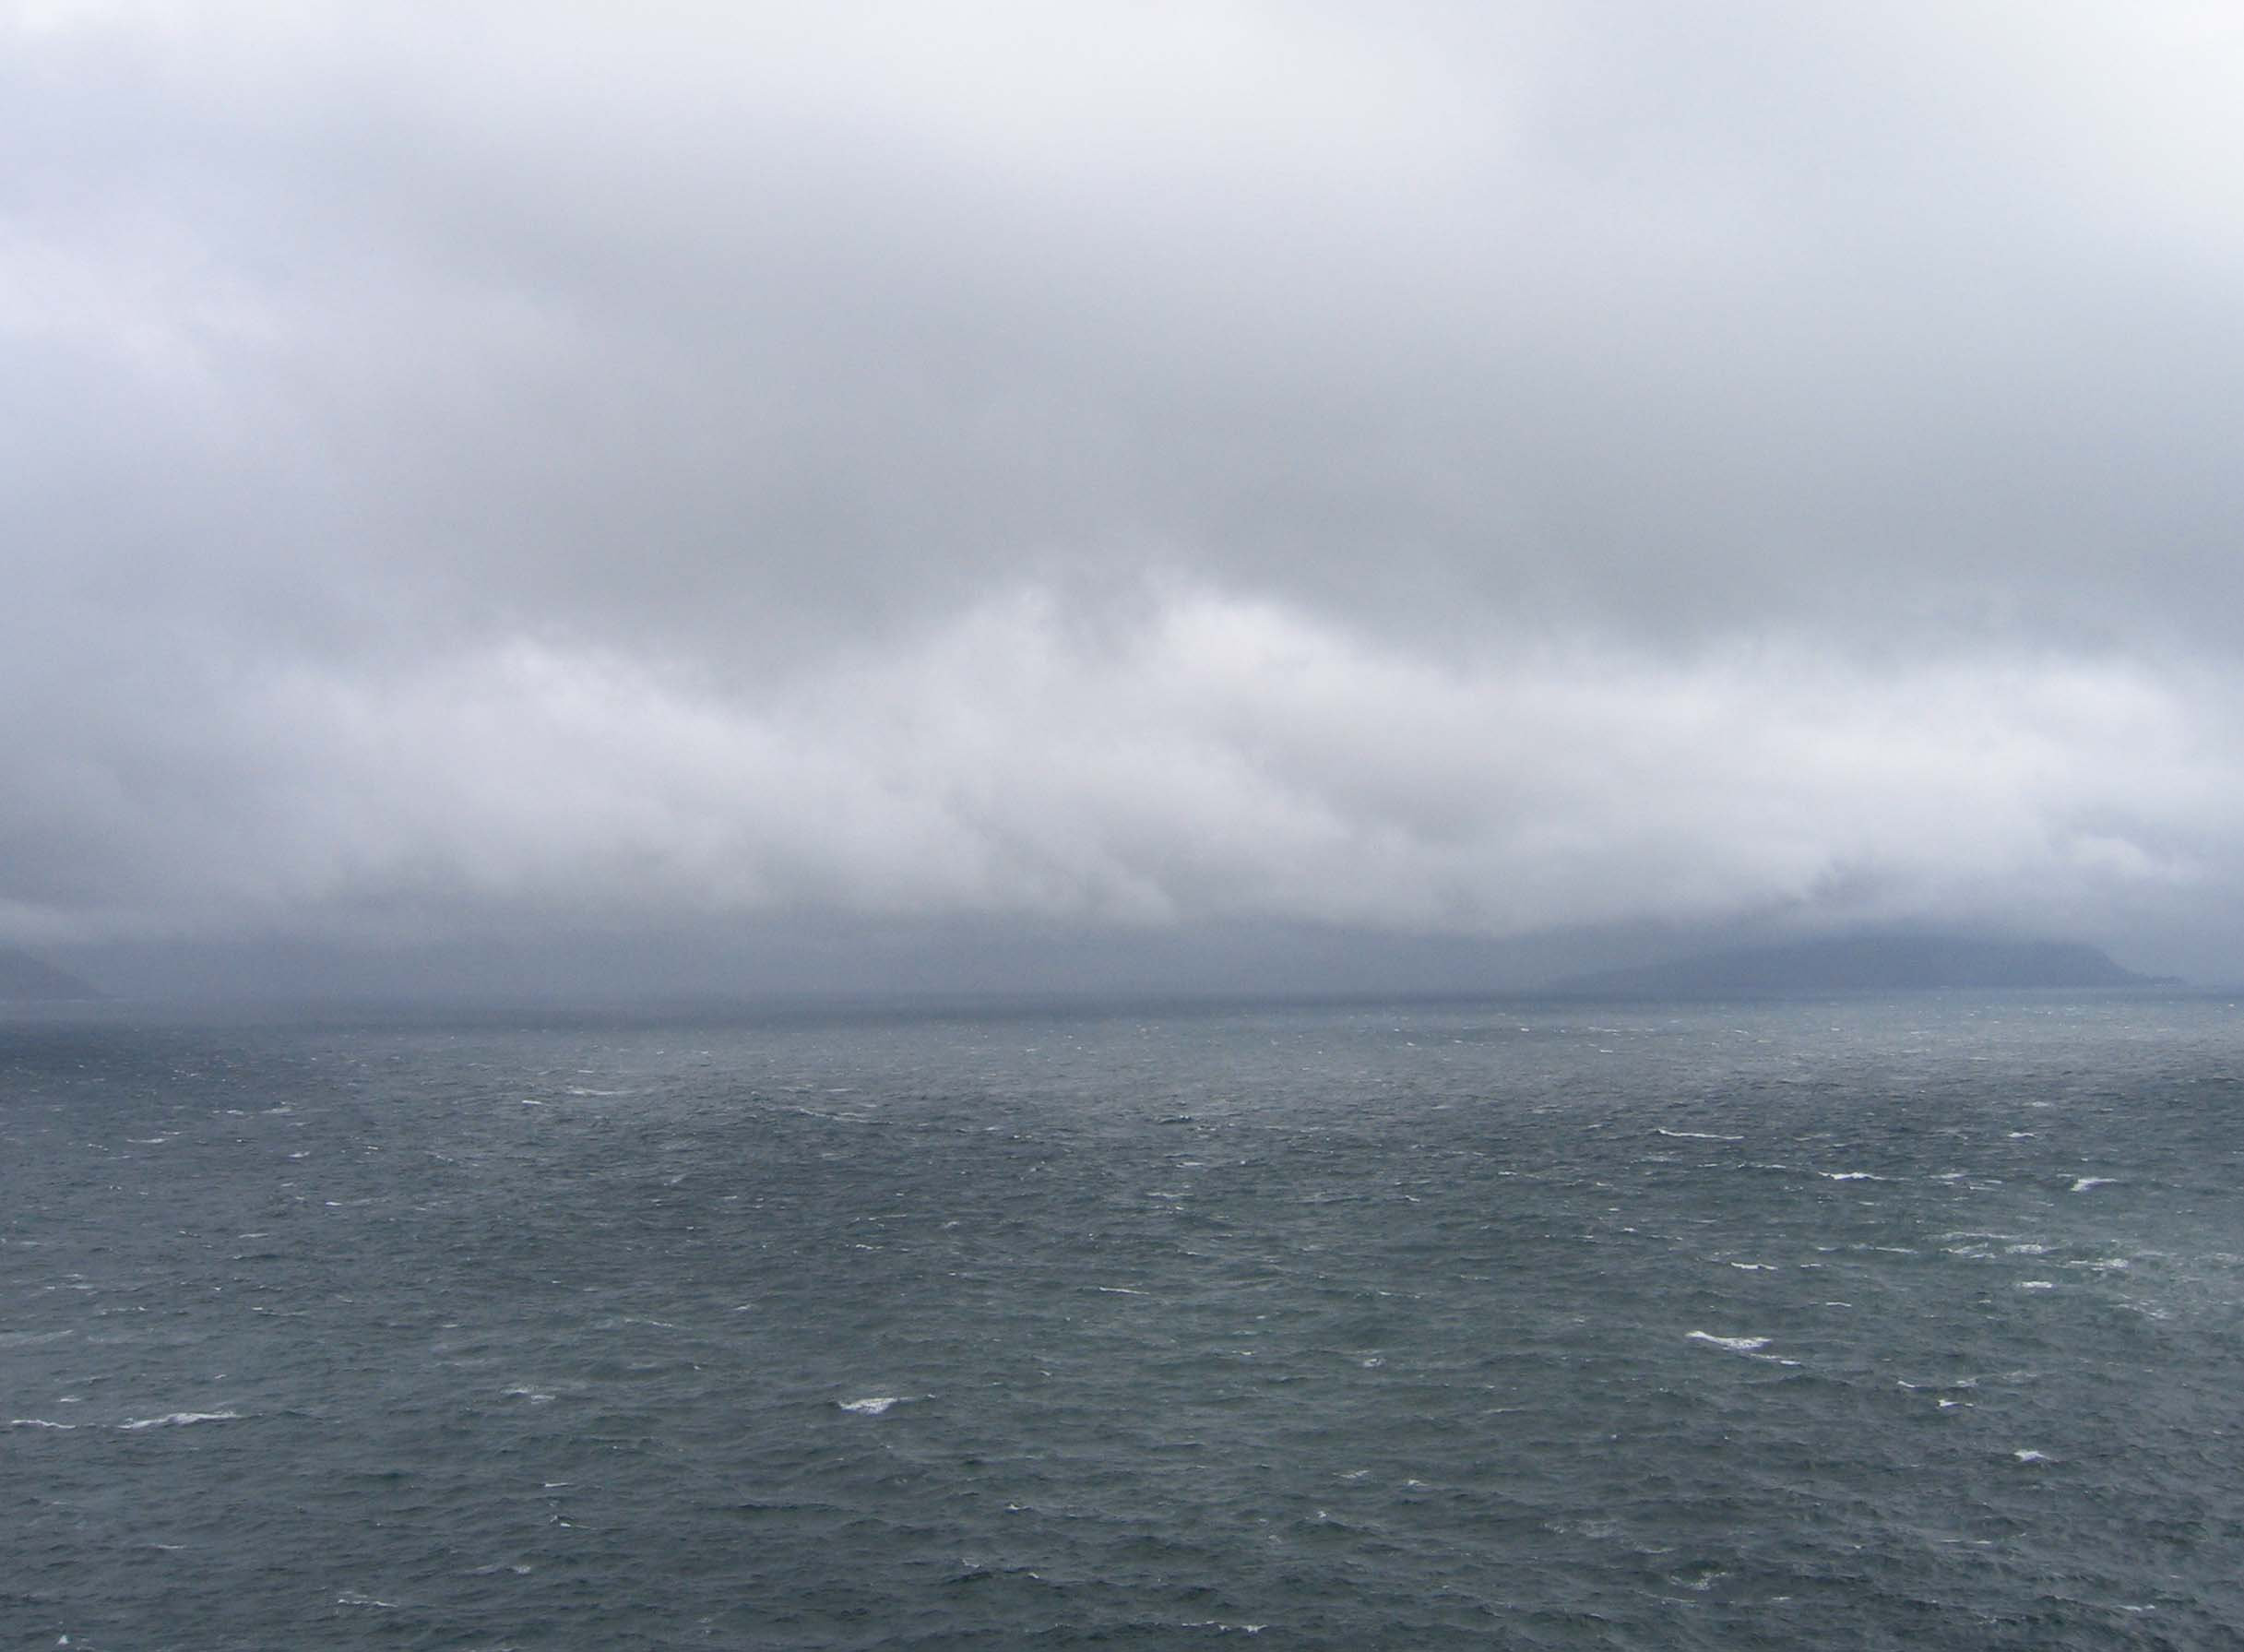 rain-stormy-sea